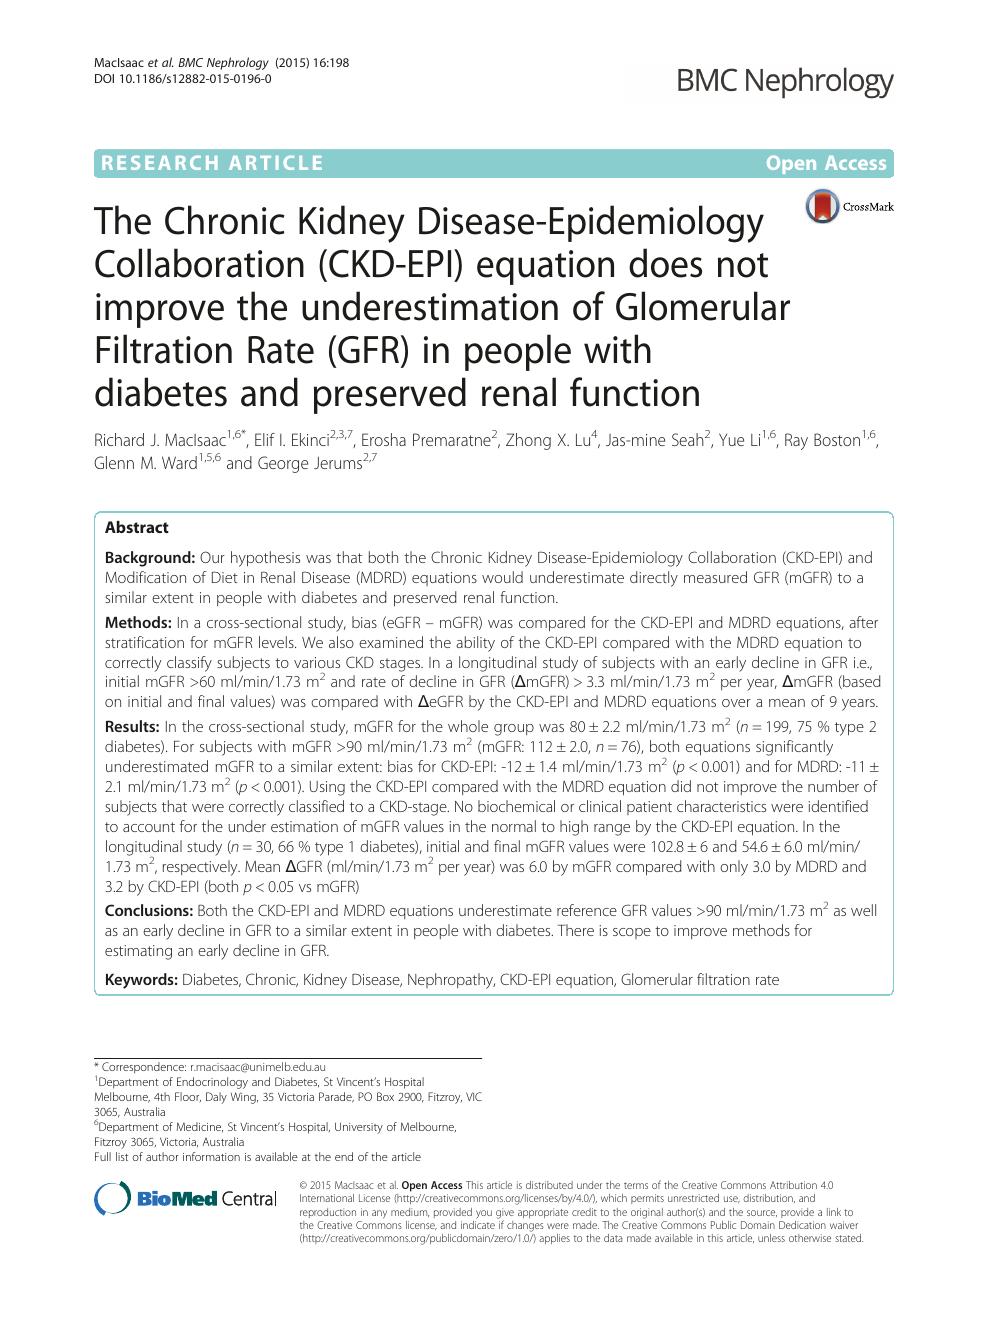 The Chronic Kidney Disease-Epidemiology Collaboration (CKD